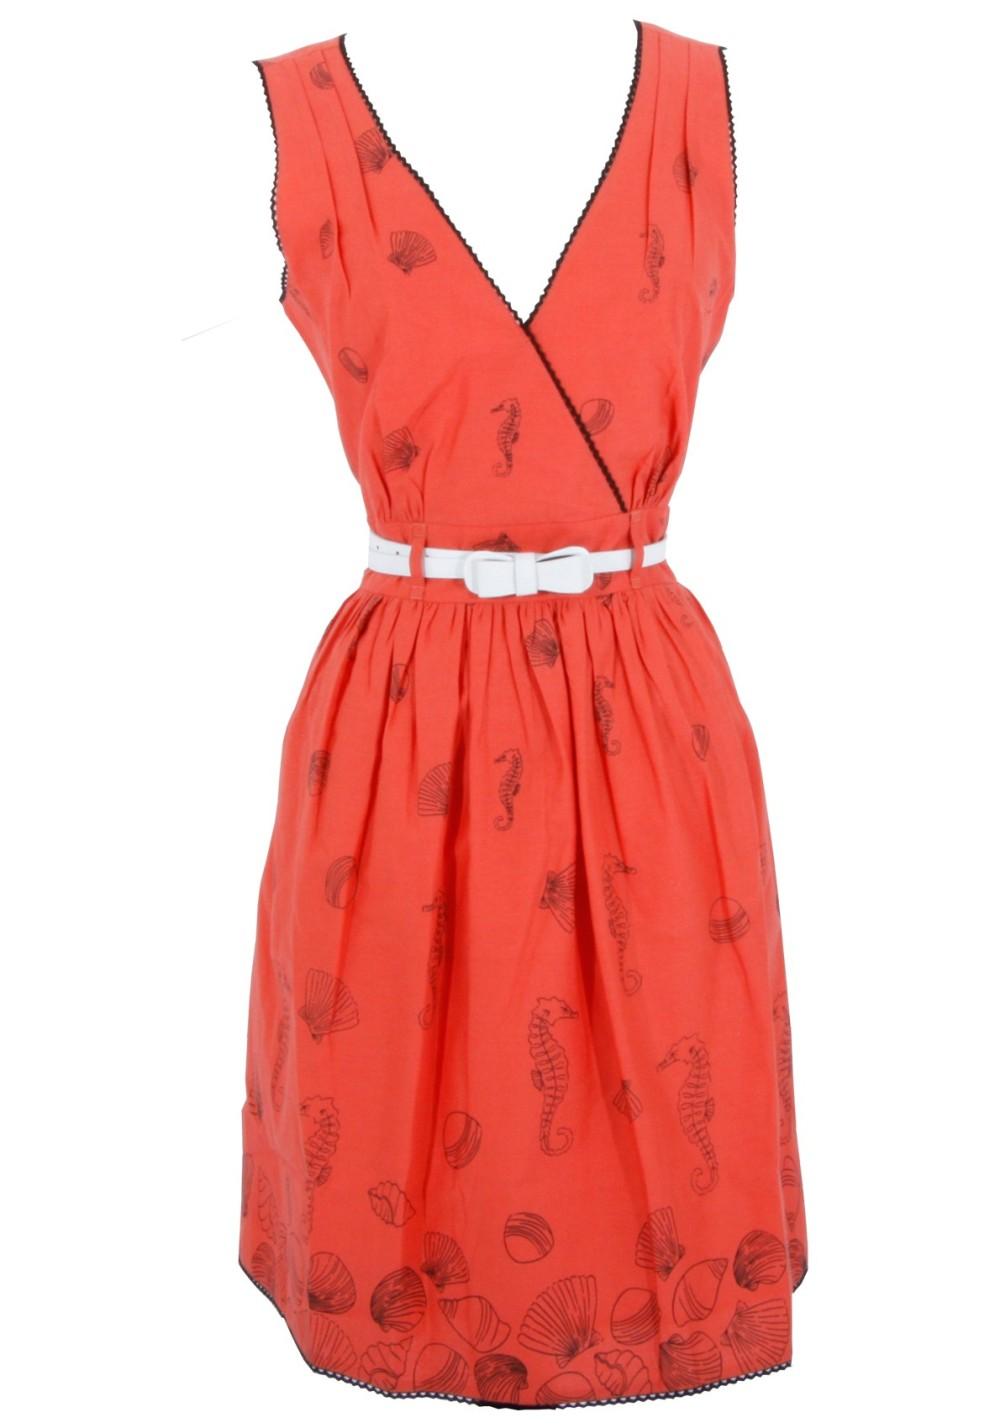 yn201_coral_dress_web